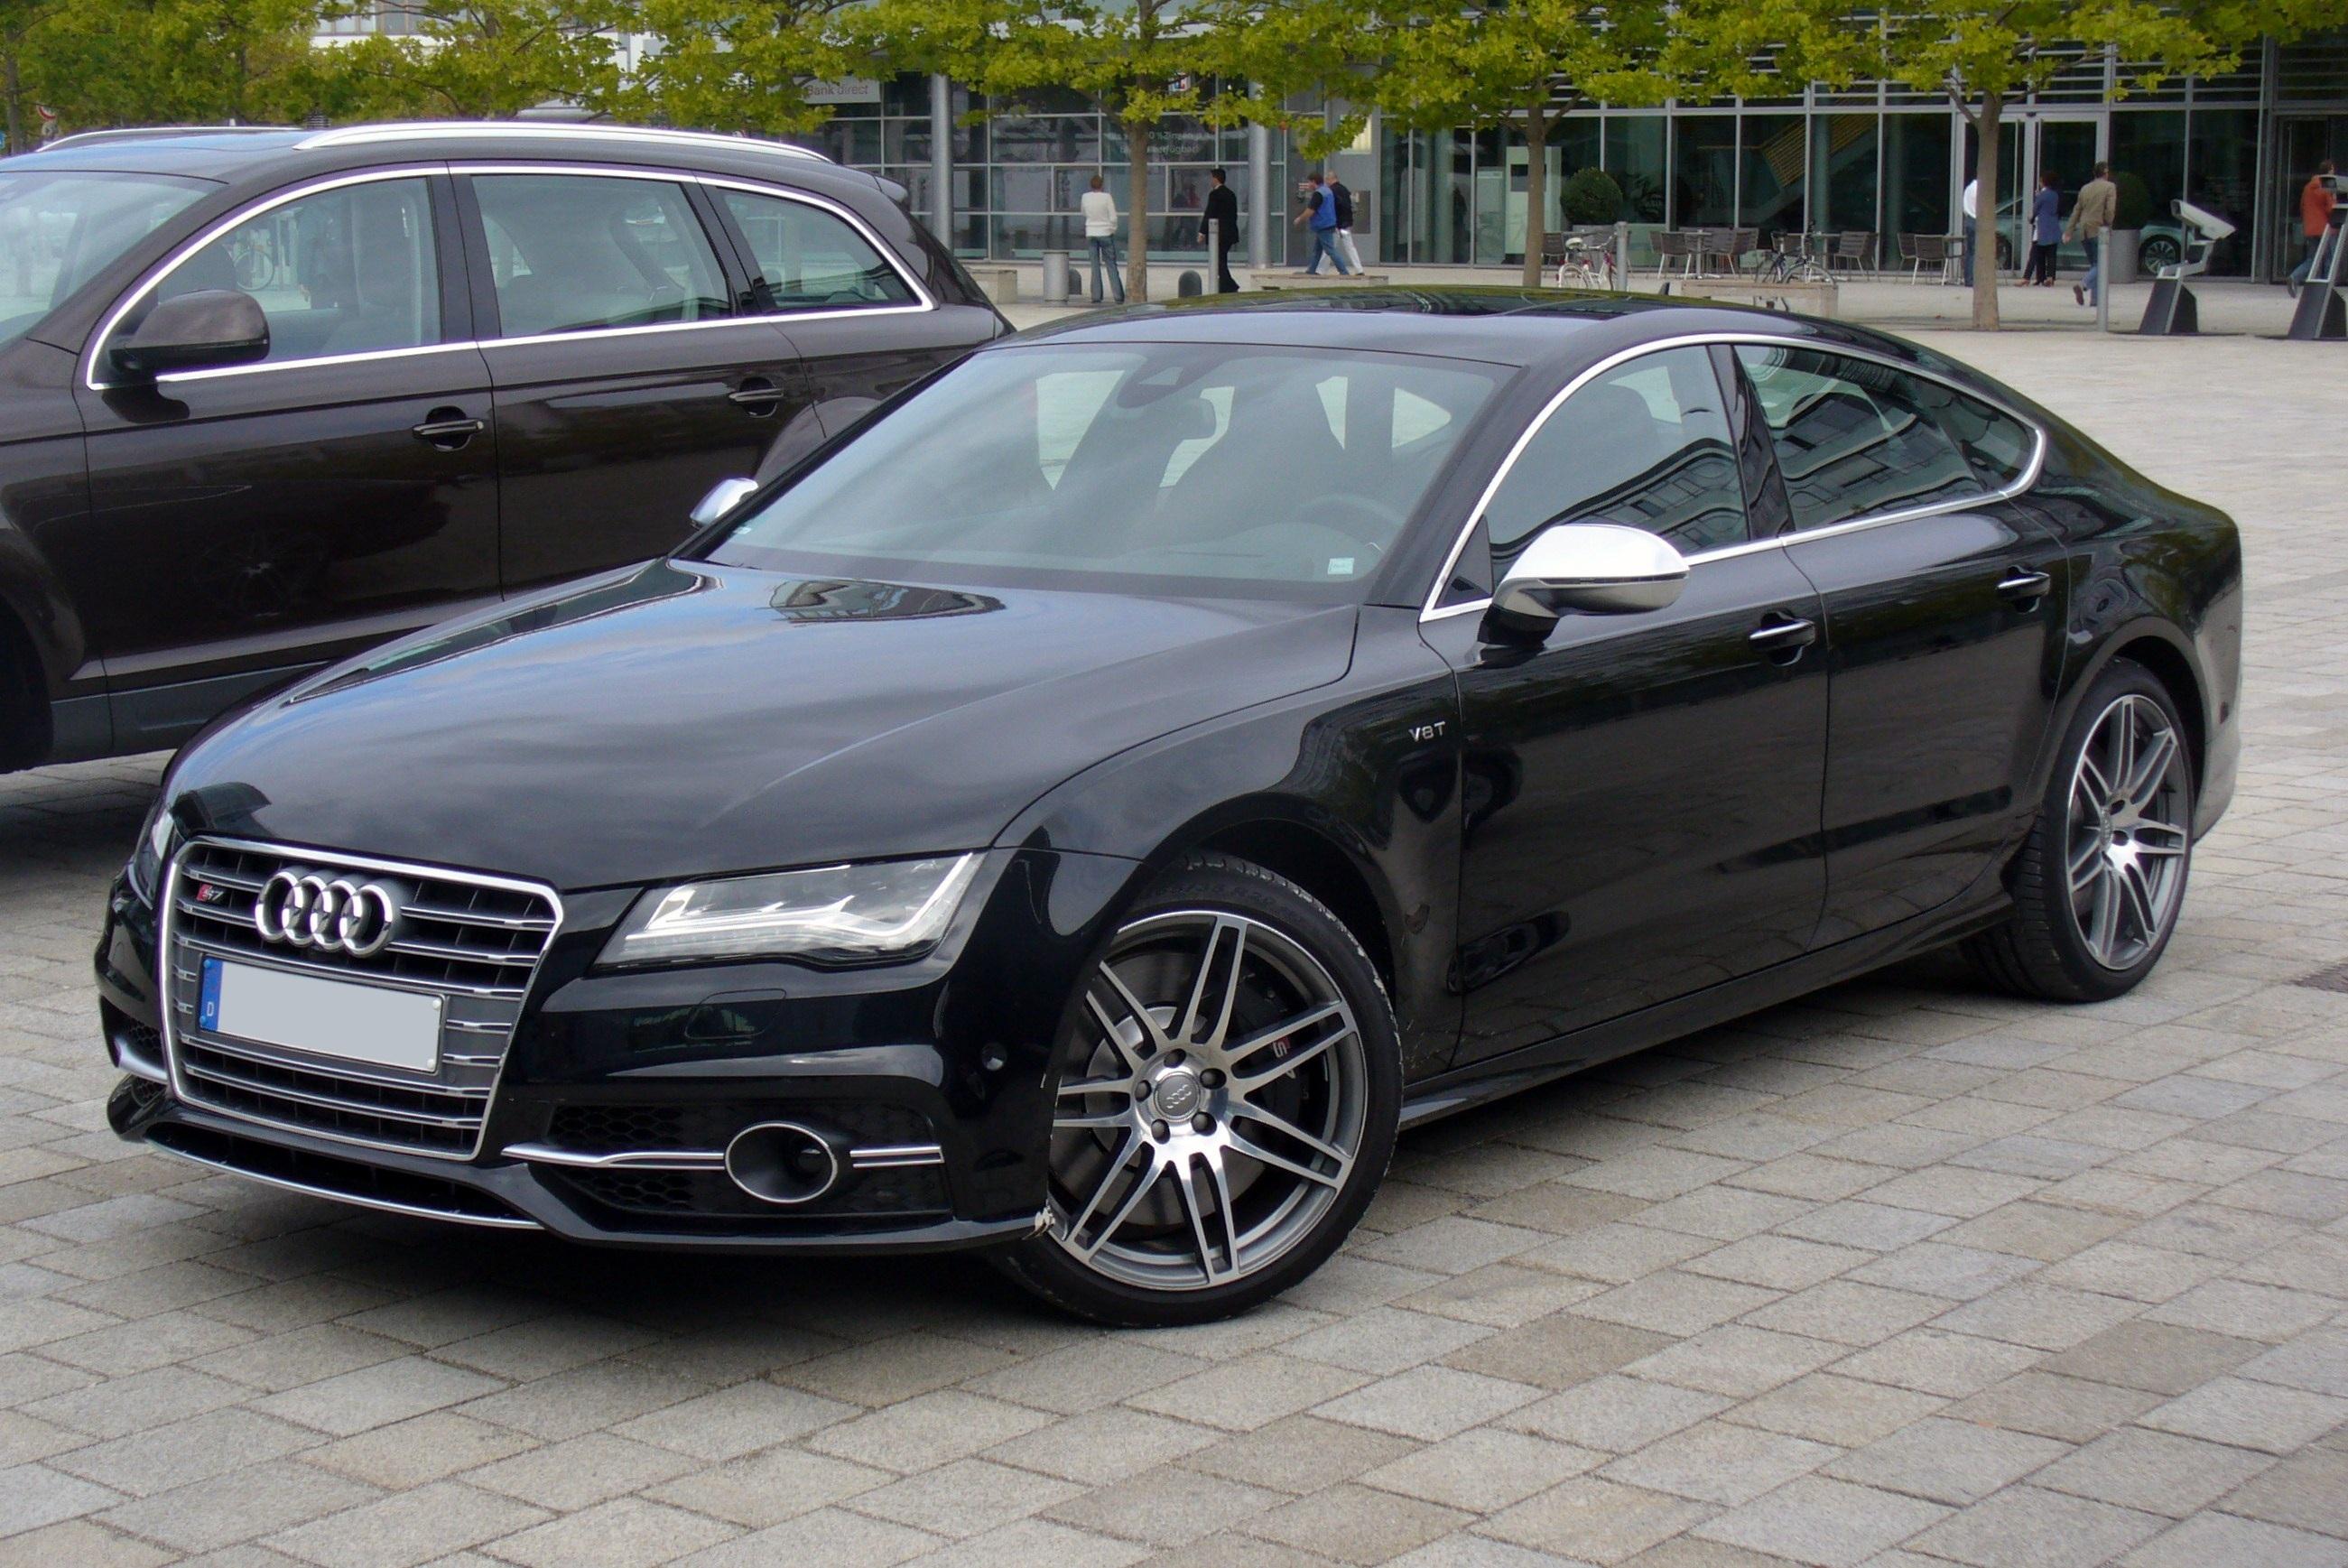 Audi Rs7 Sportback Modified